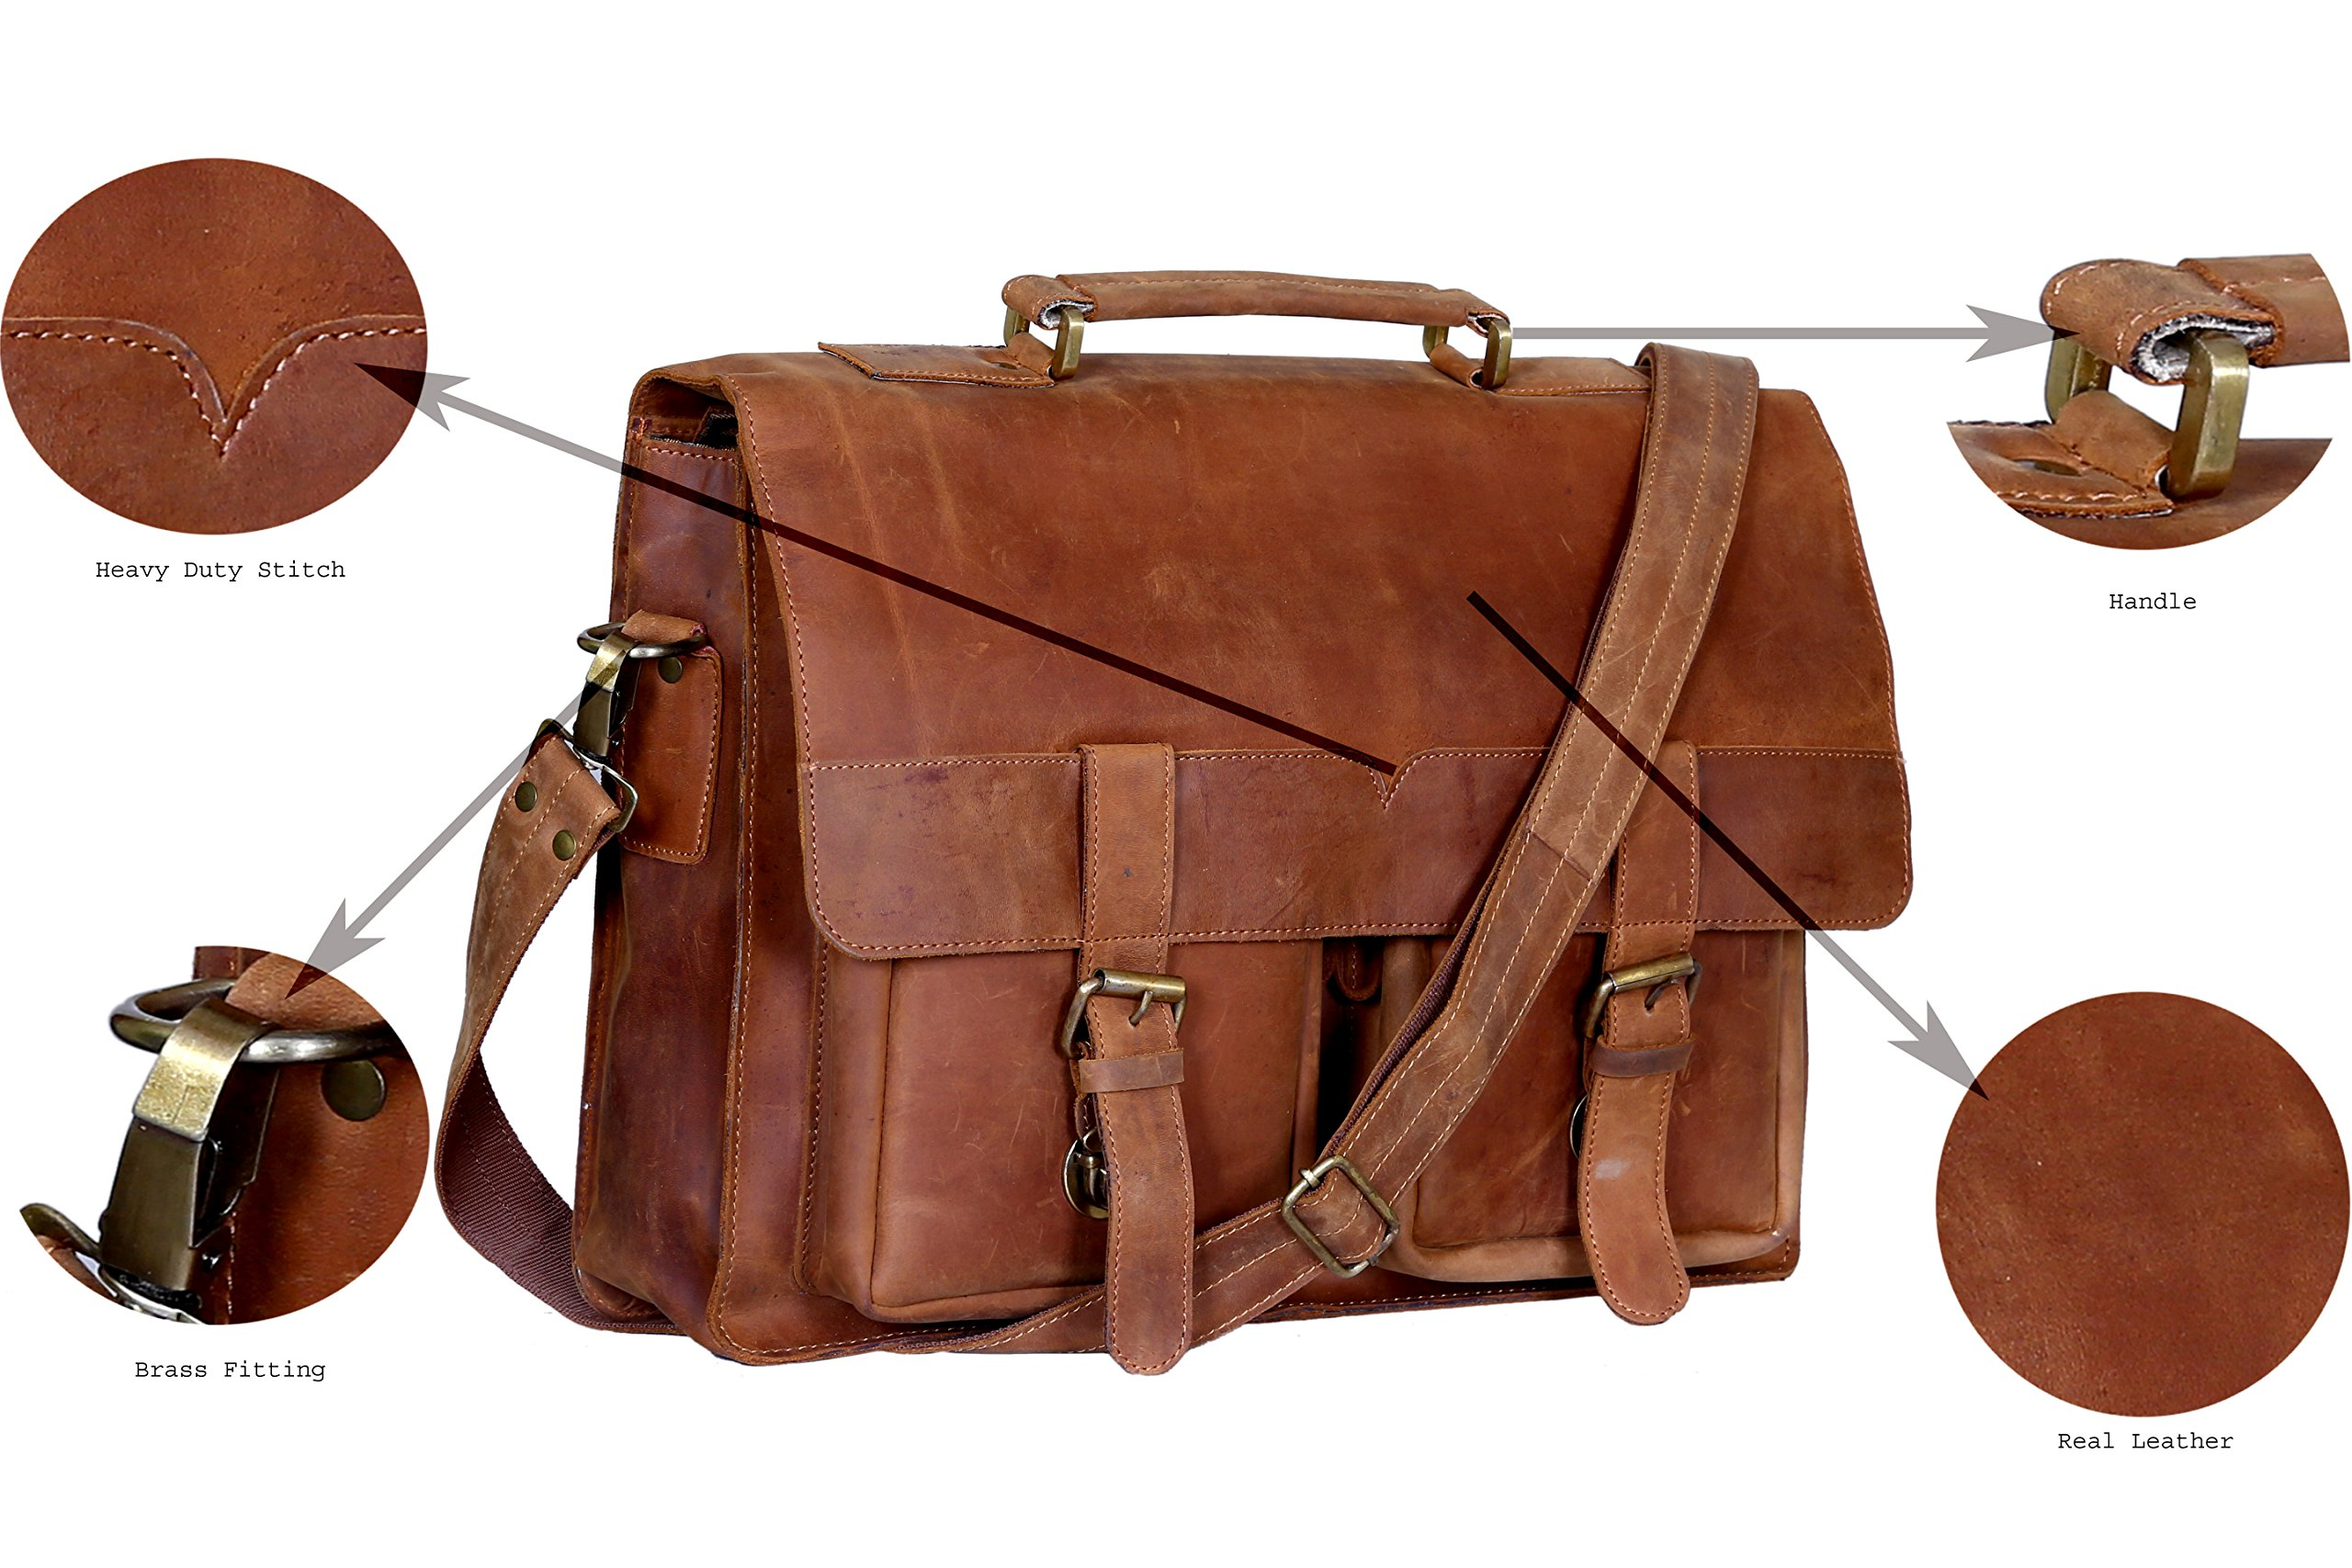 Leather messenger bag 16 inch Retro handmade buffalo hunter messenger bag Rugged & Distressed College School bag